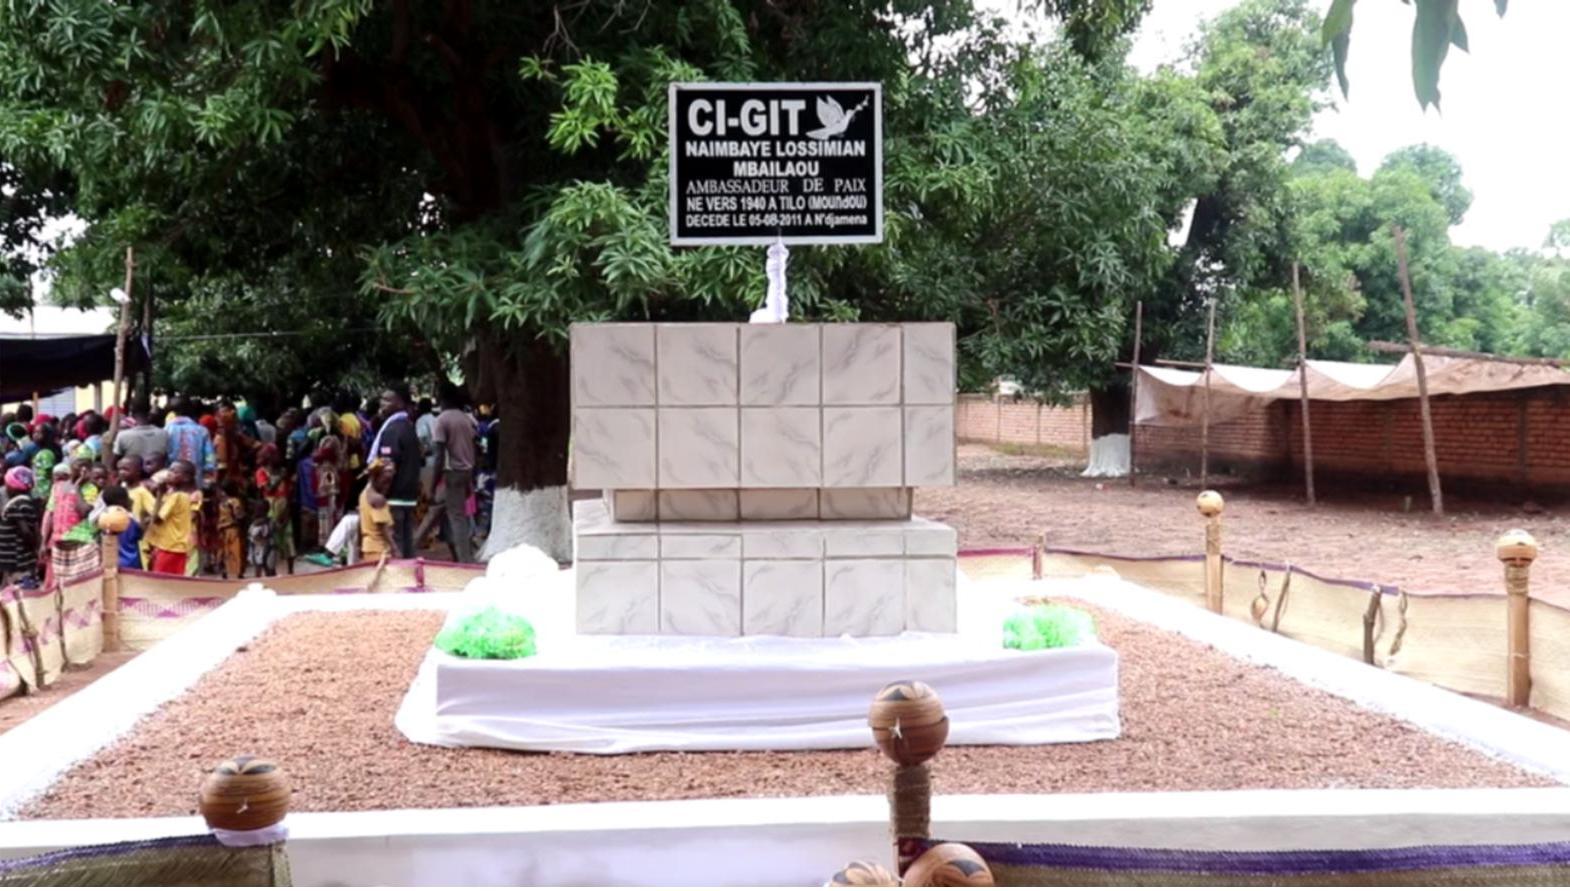 Tchad : commémoration du 10e anniversaire de la mort de Mbaïlao Naïmbaye Lossimian